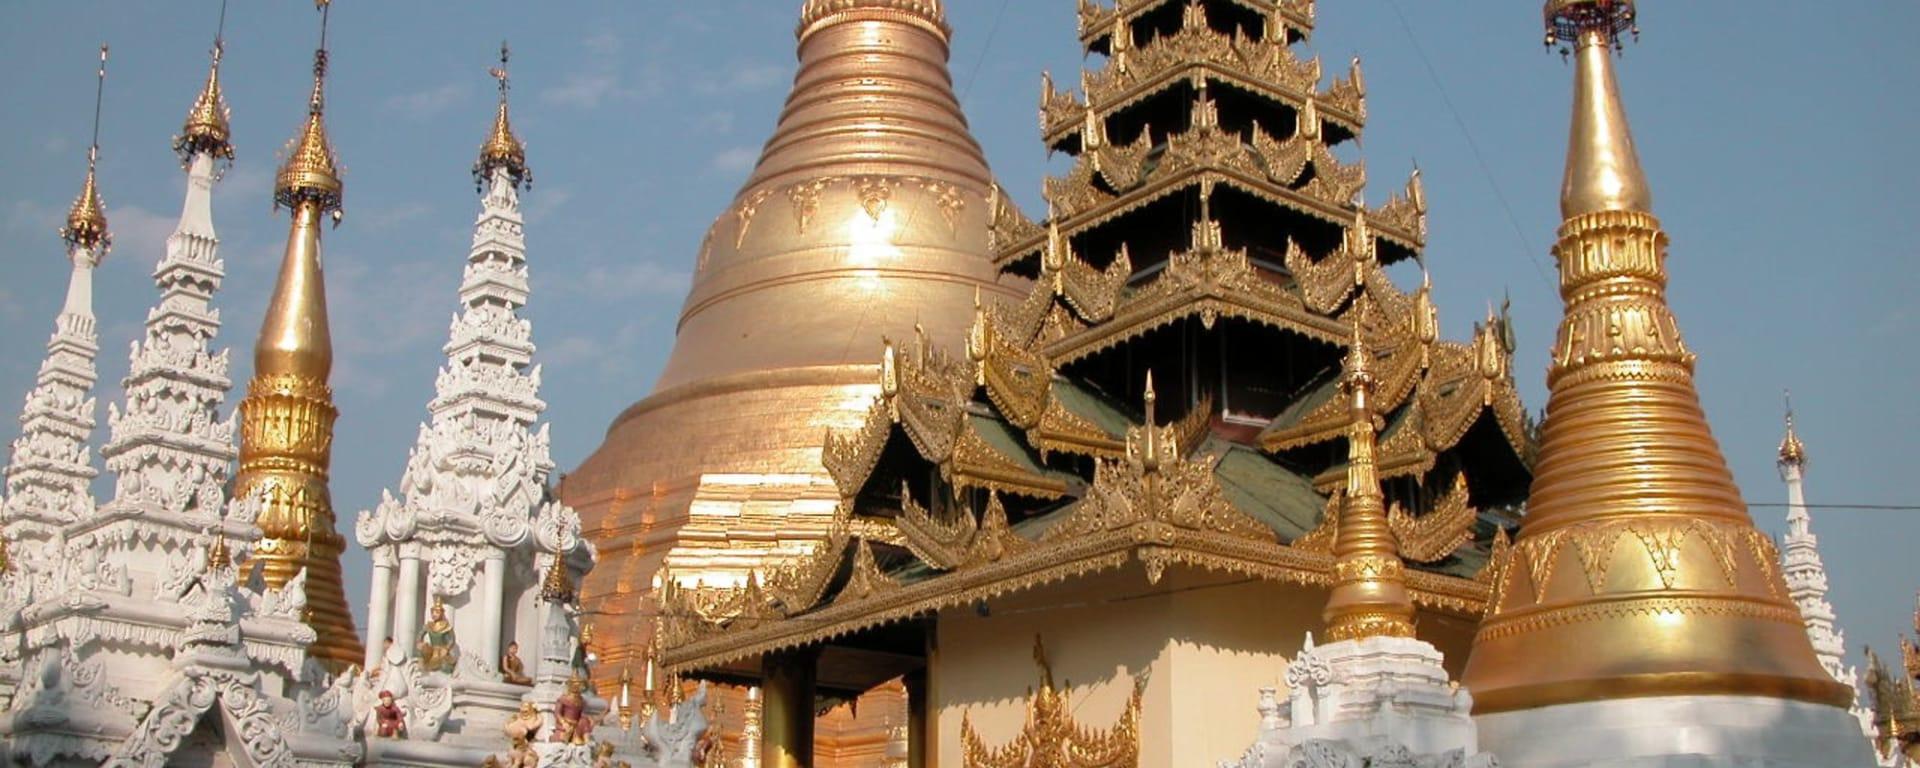 Tour de ville de Yangon: Yangon Shwedagon 002